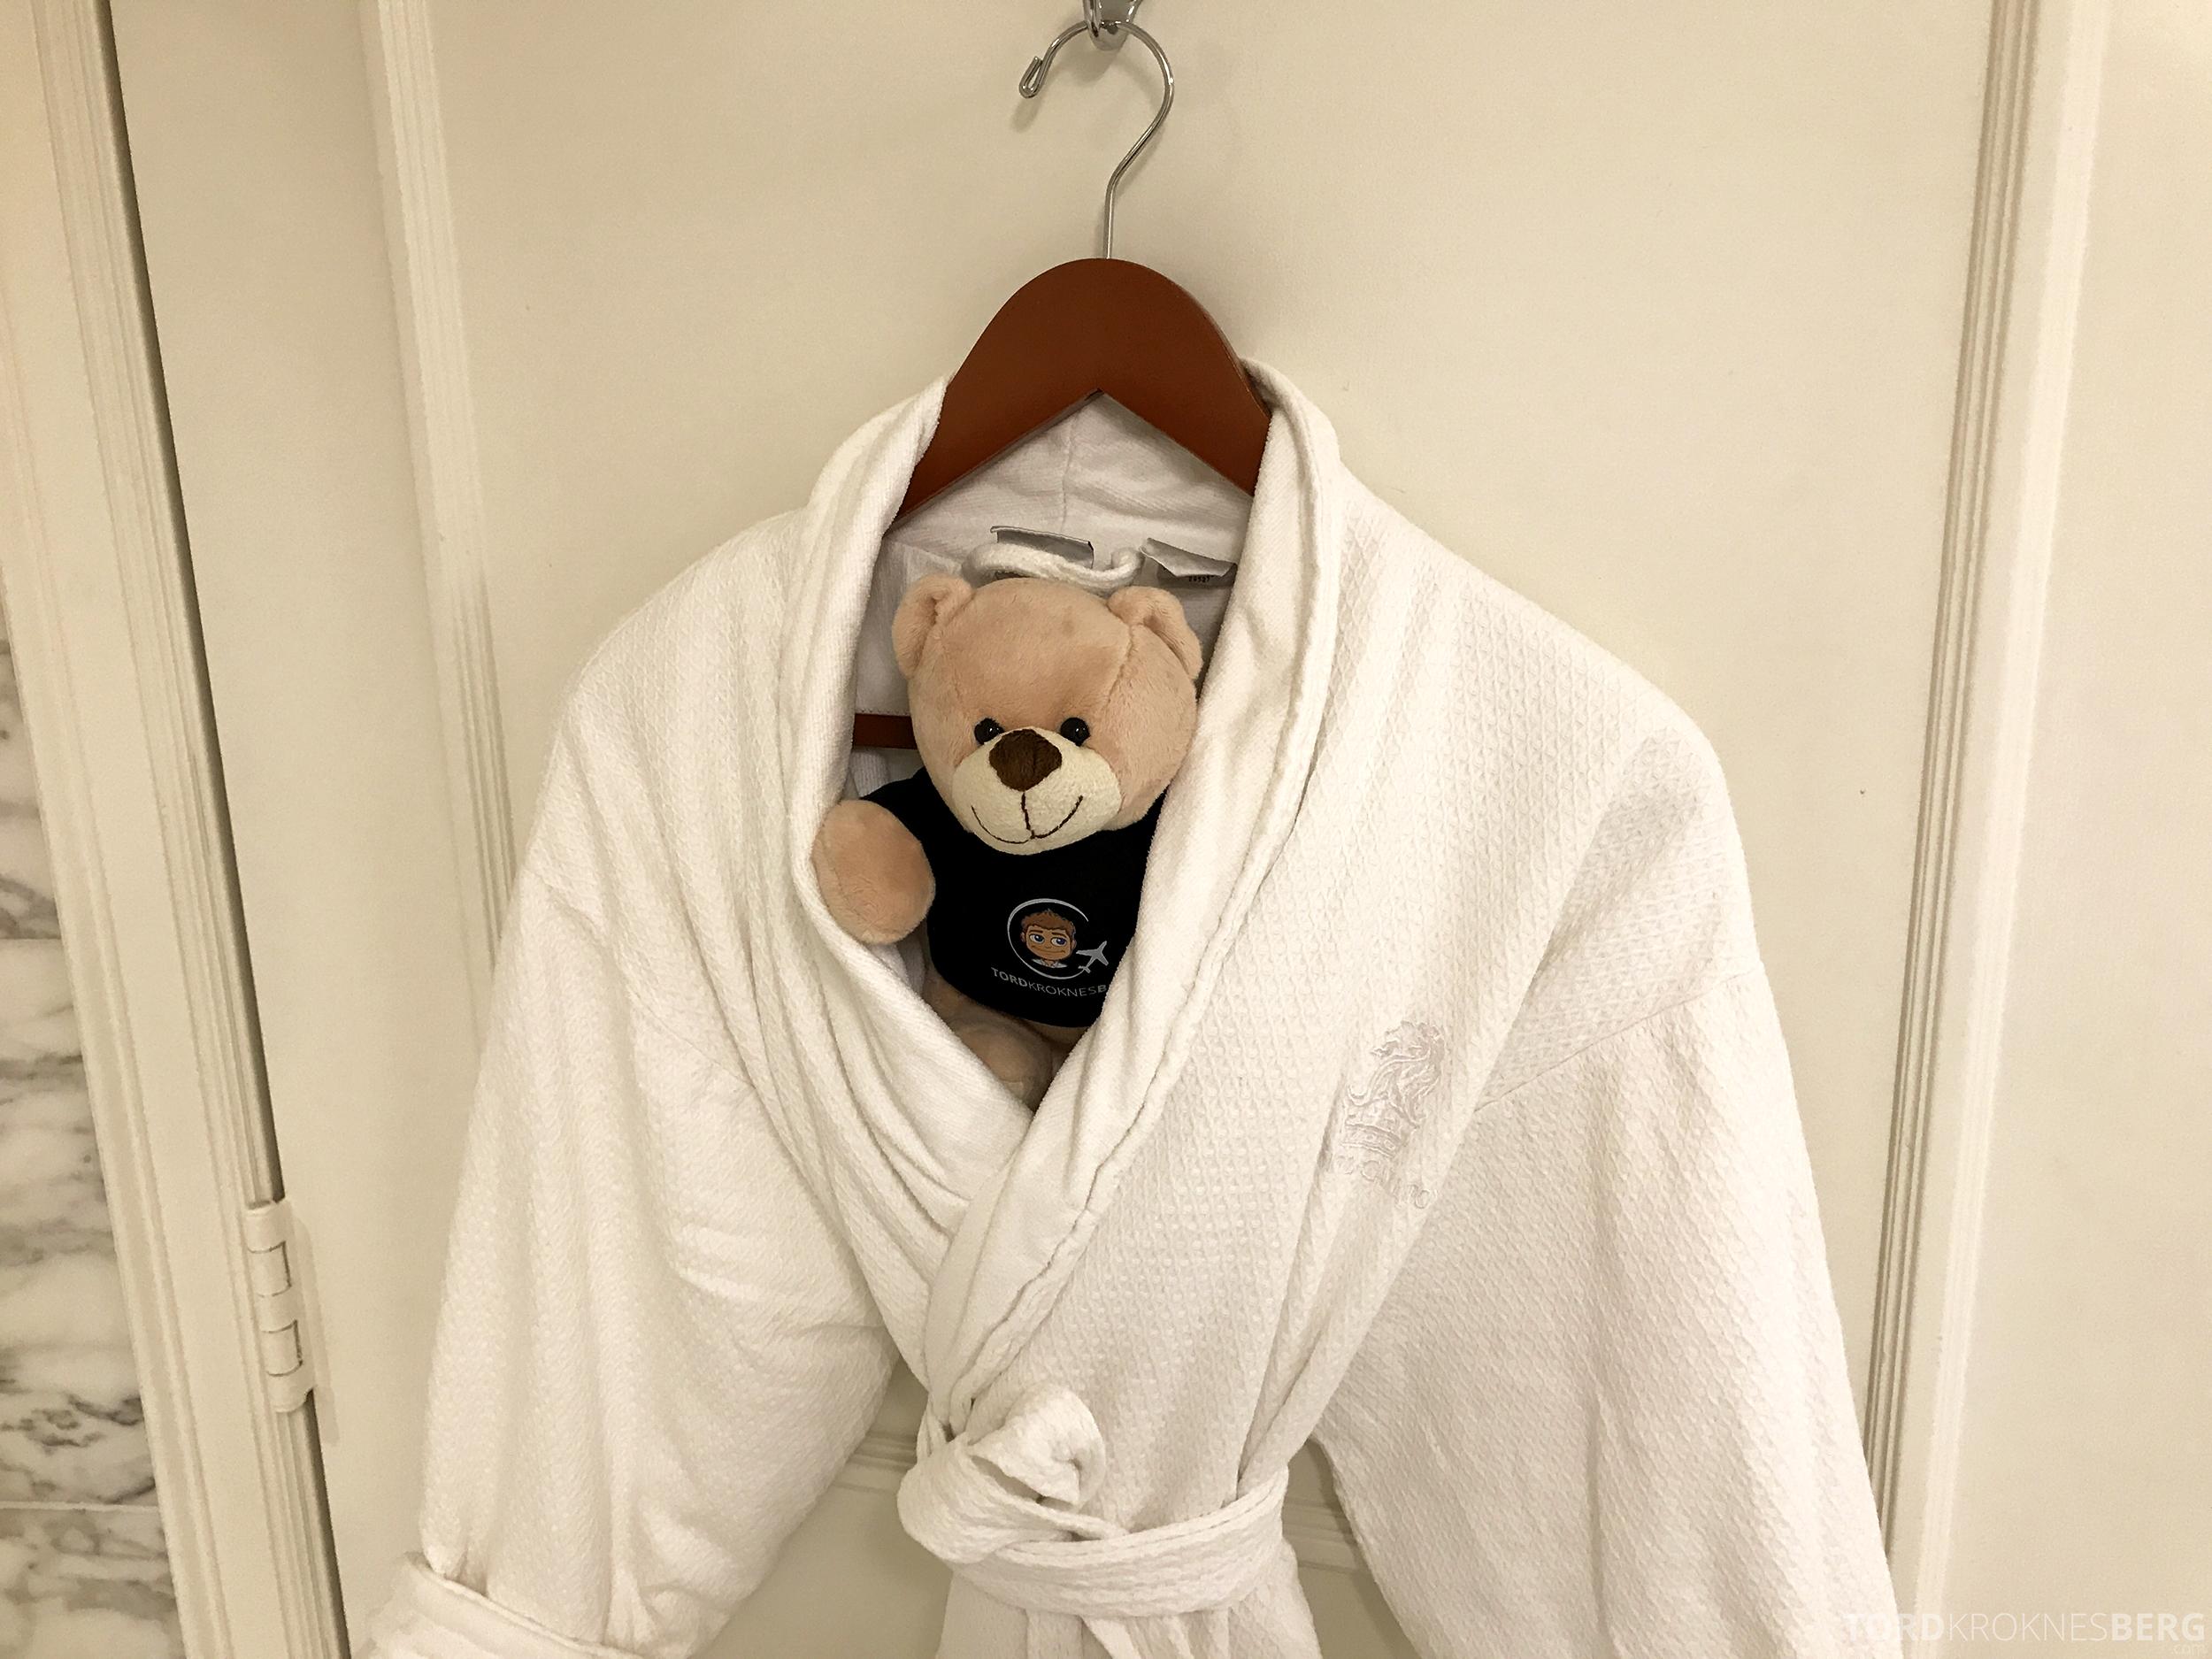 Ritz-Carlton San Francisco Hotel reisefølget badekåpe